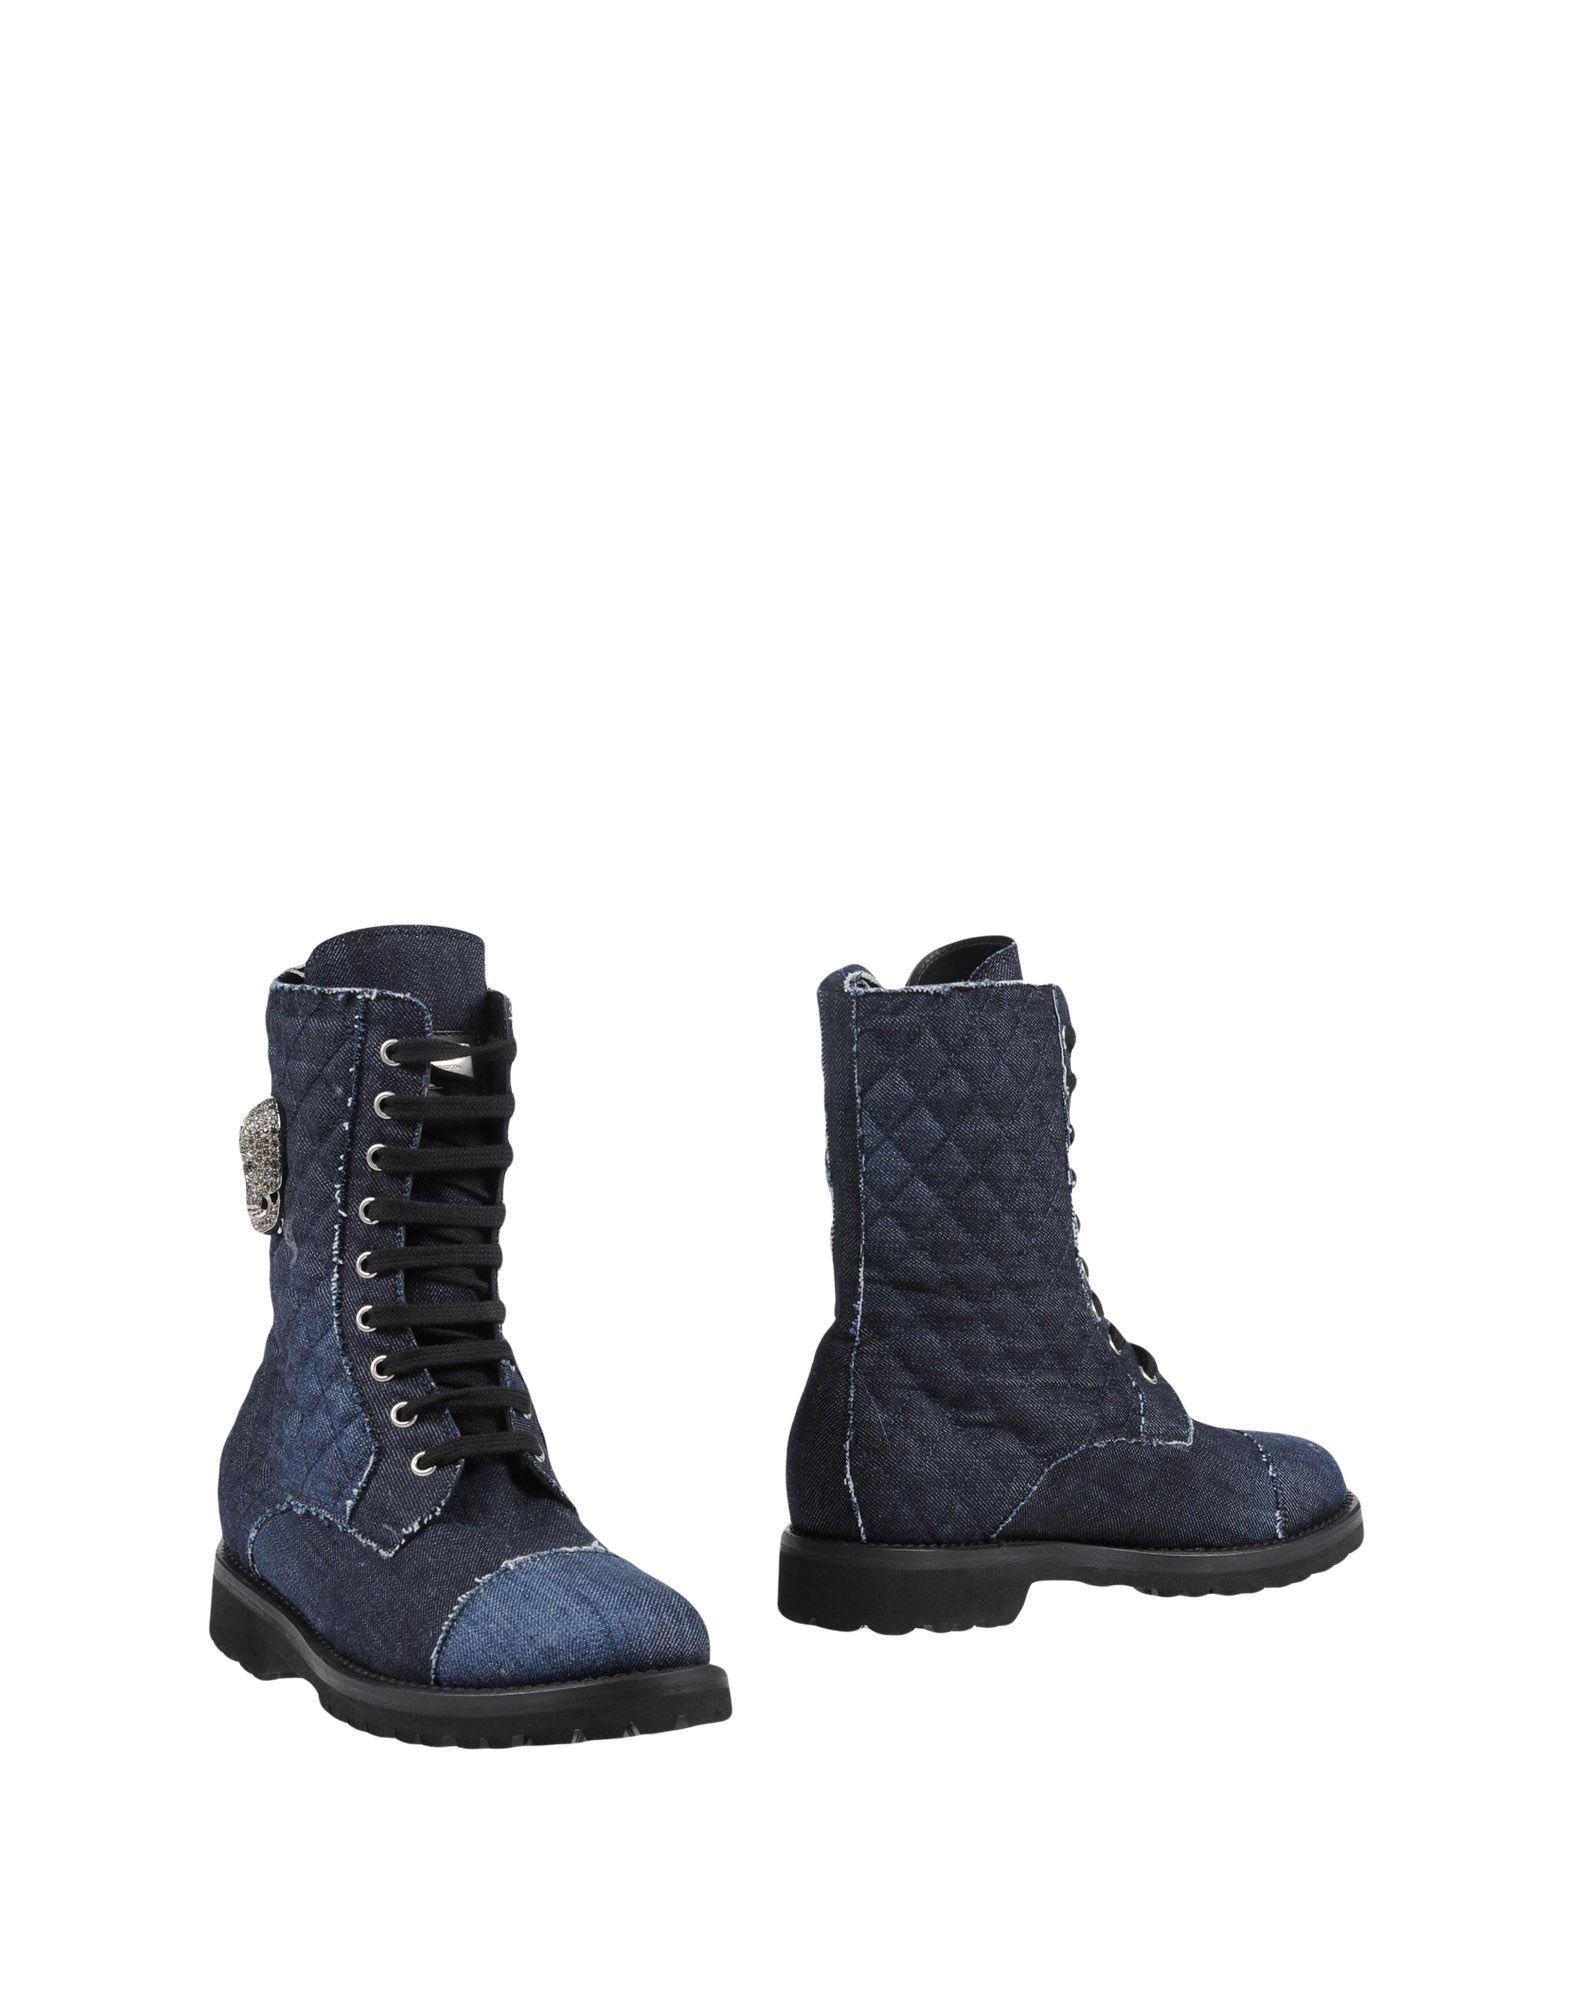 Philipp Plein Ankle Boot In Blue